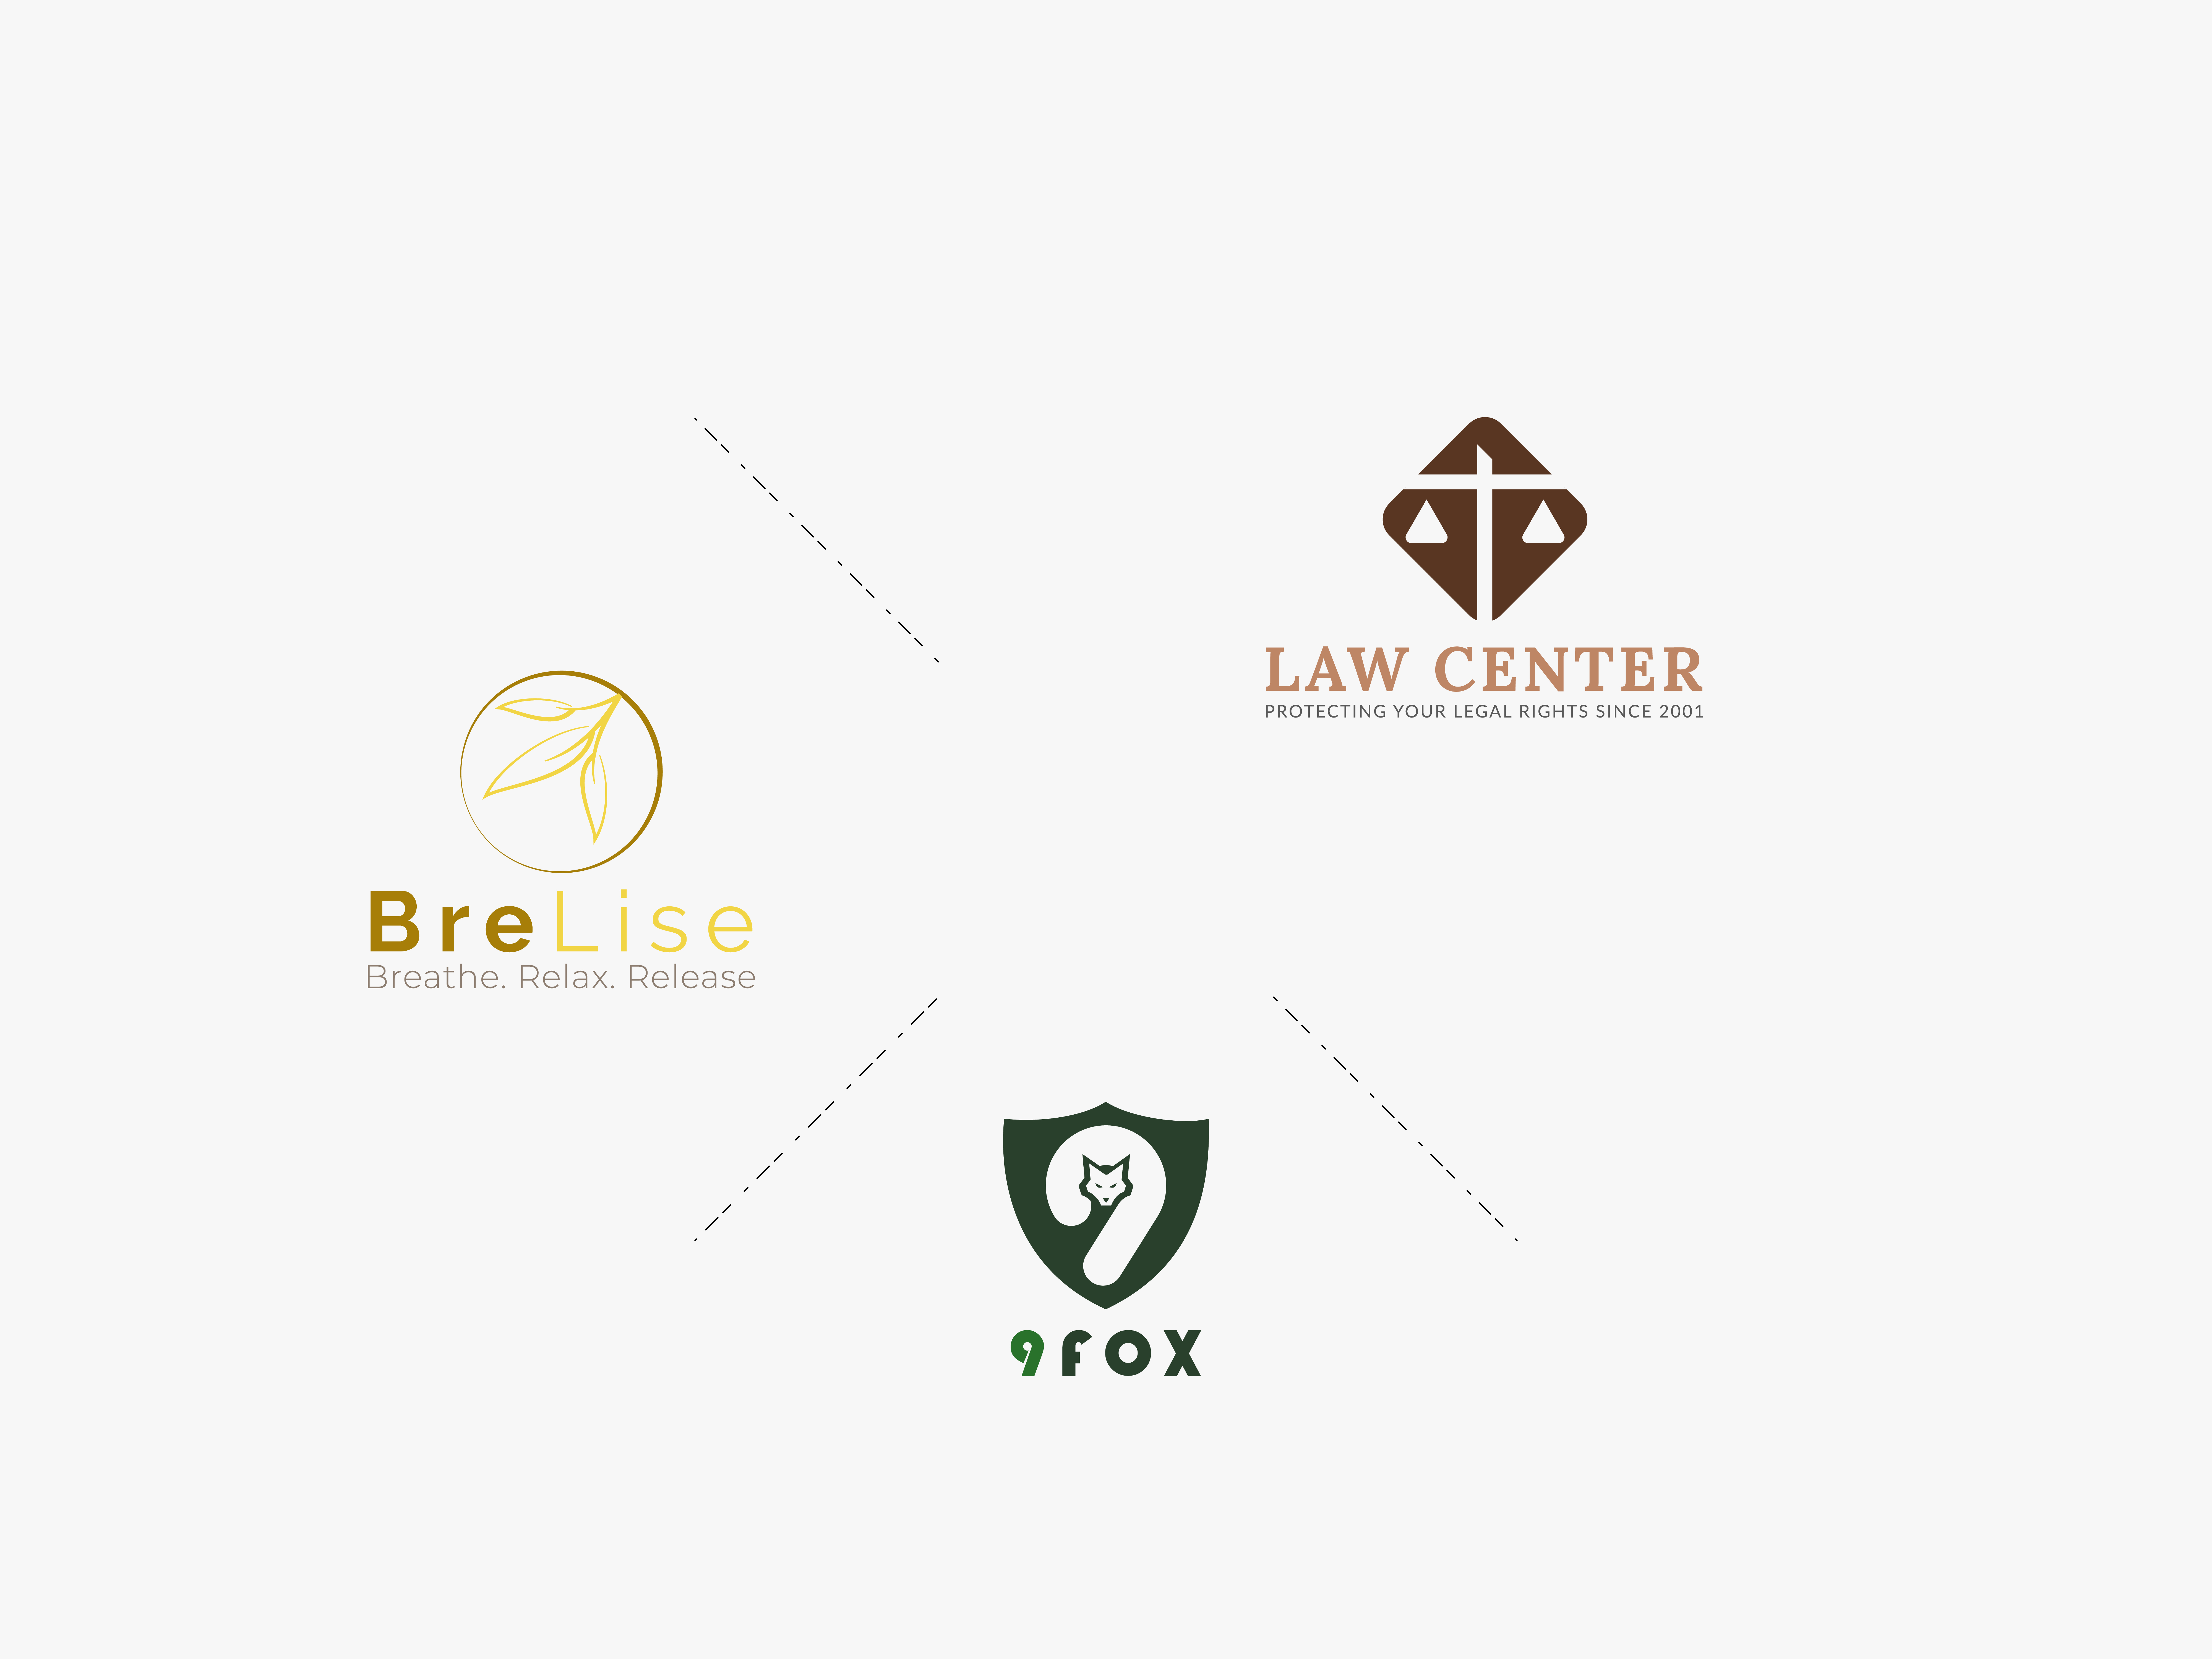 I will do professional minimalist modern logo design for business